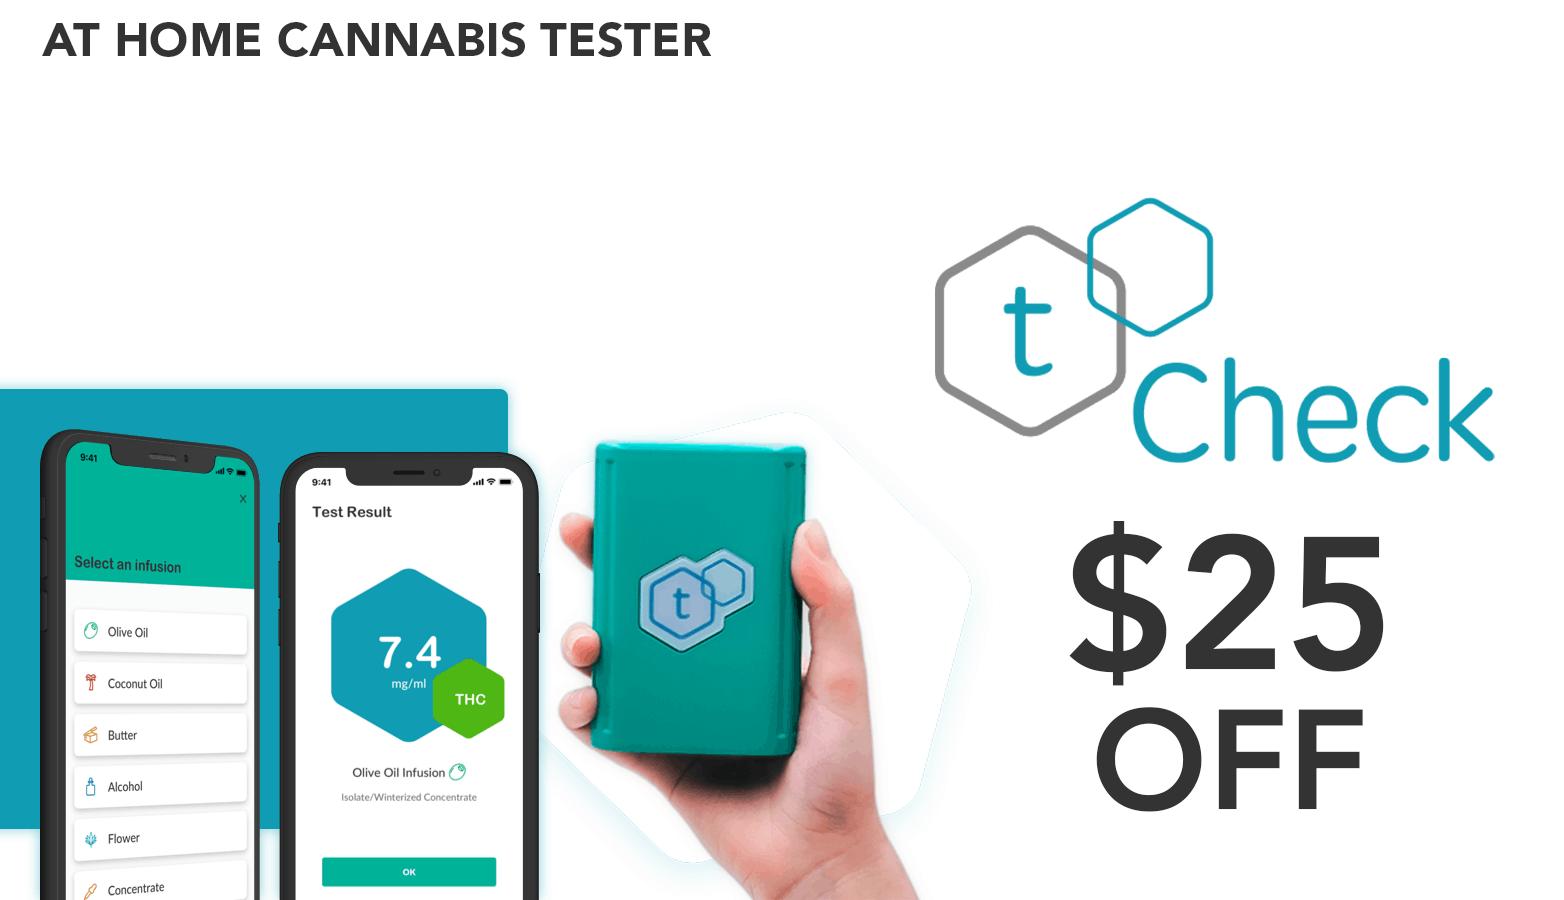 tCheck CBD Coupon Code discounts promos save on cannabis online website